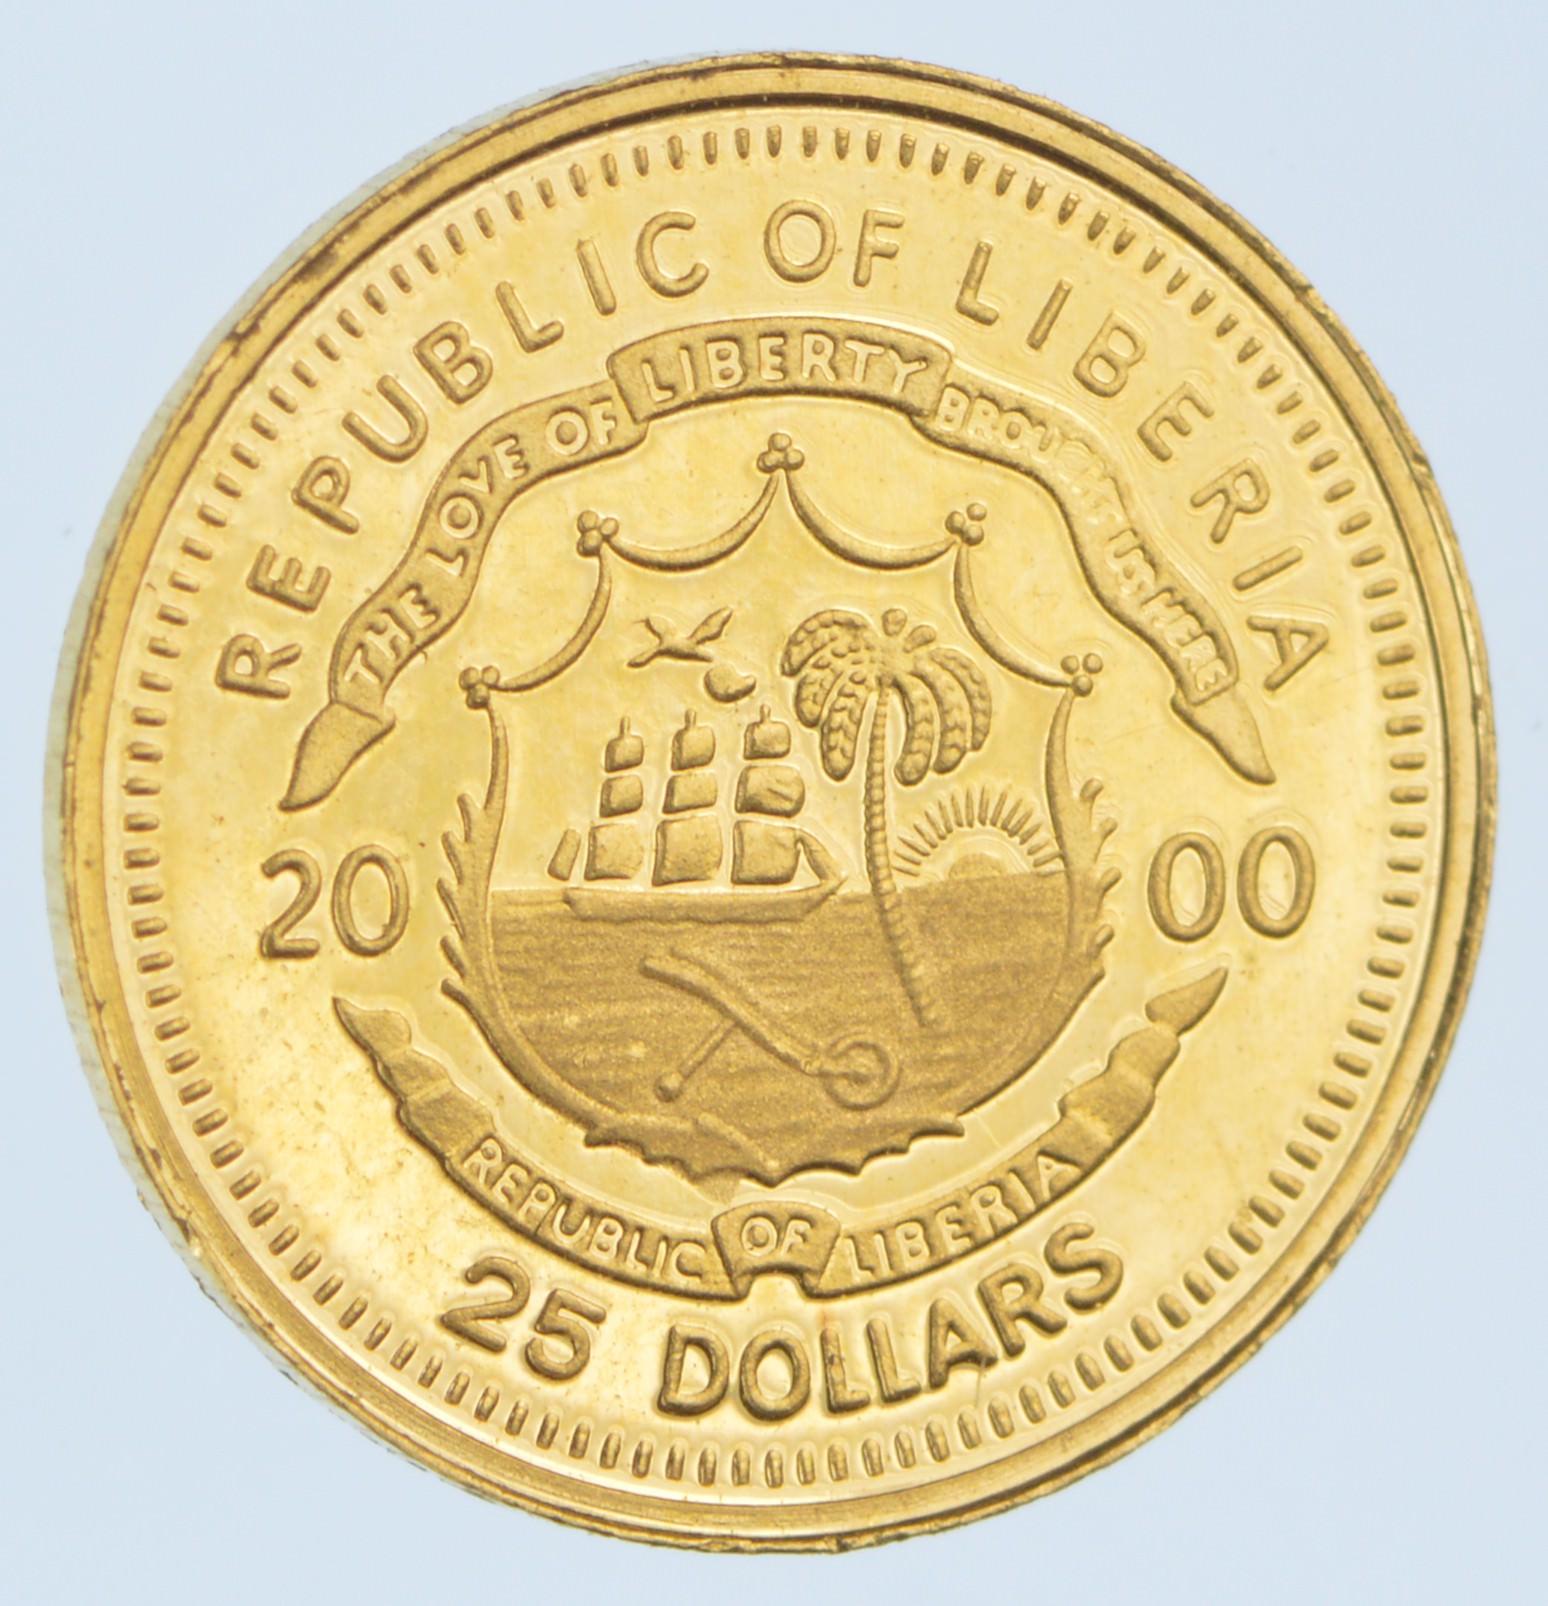 2000 Republic Of Liberia 25 Dollars Gold Coin